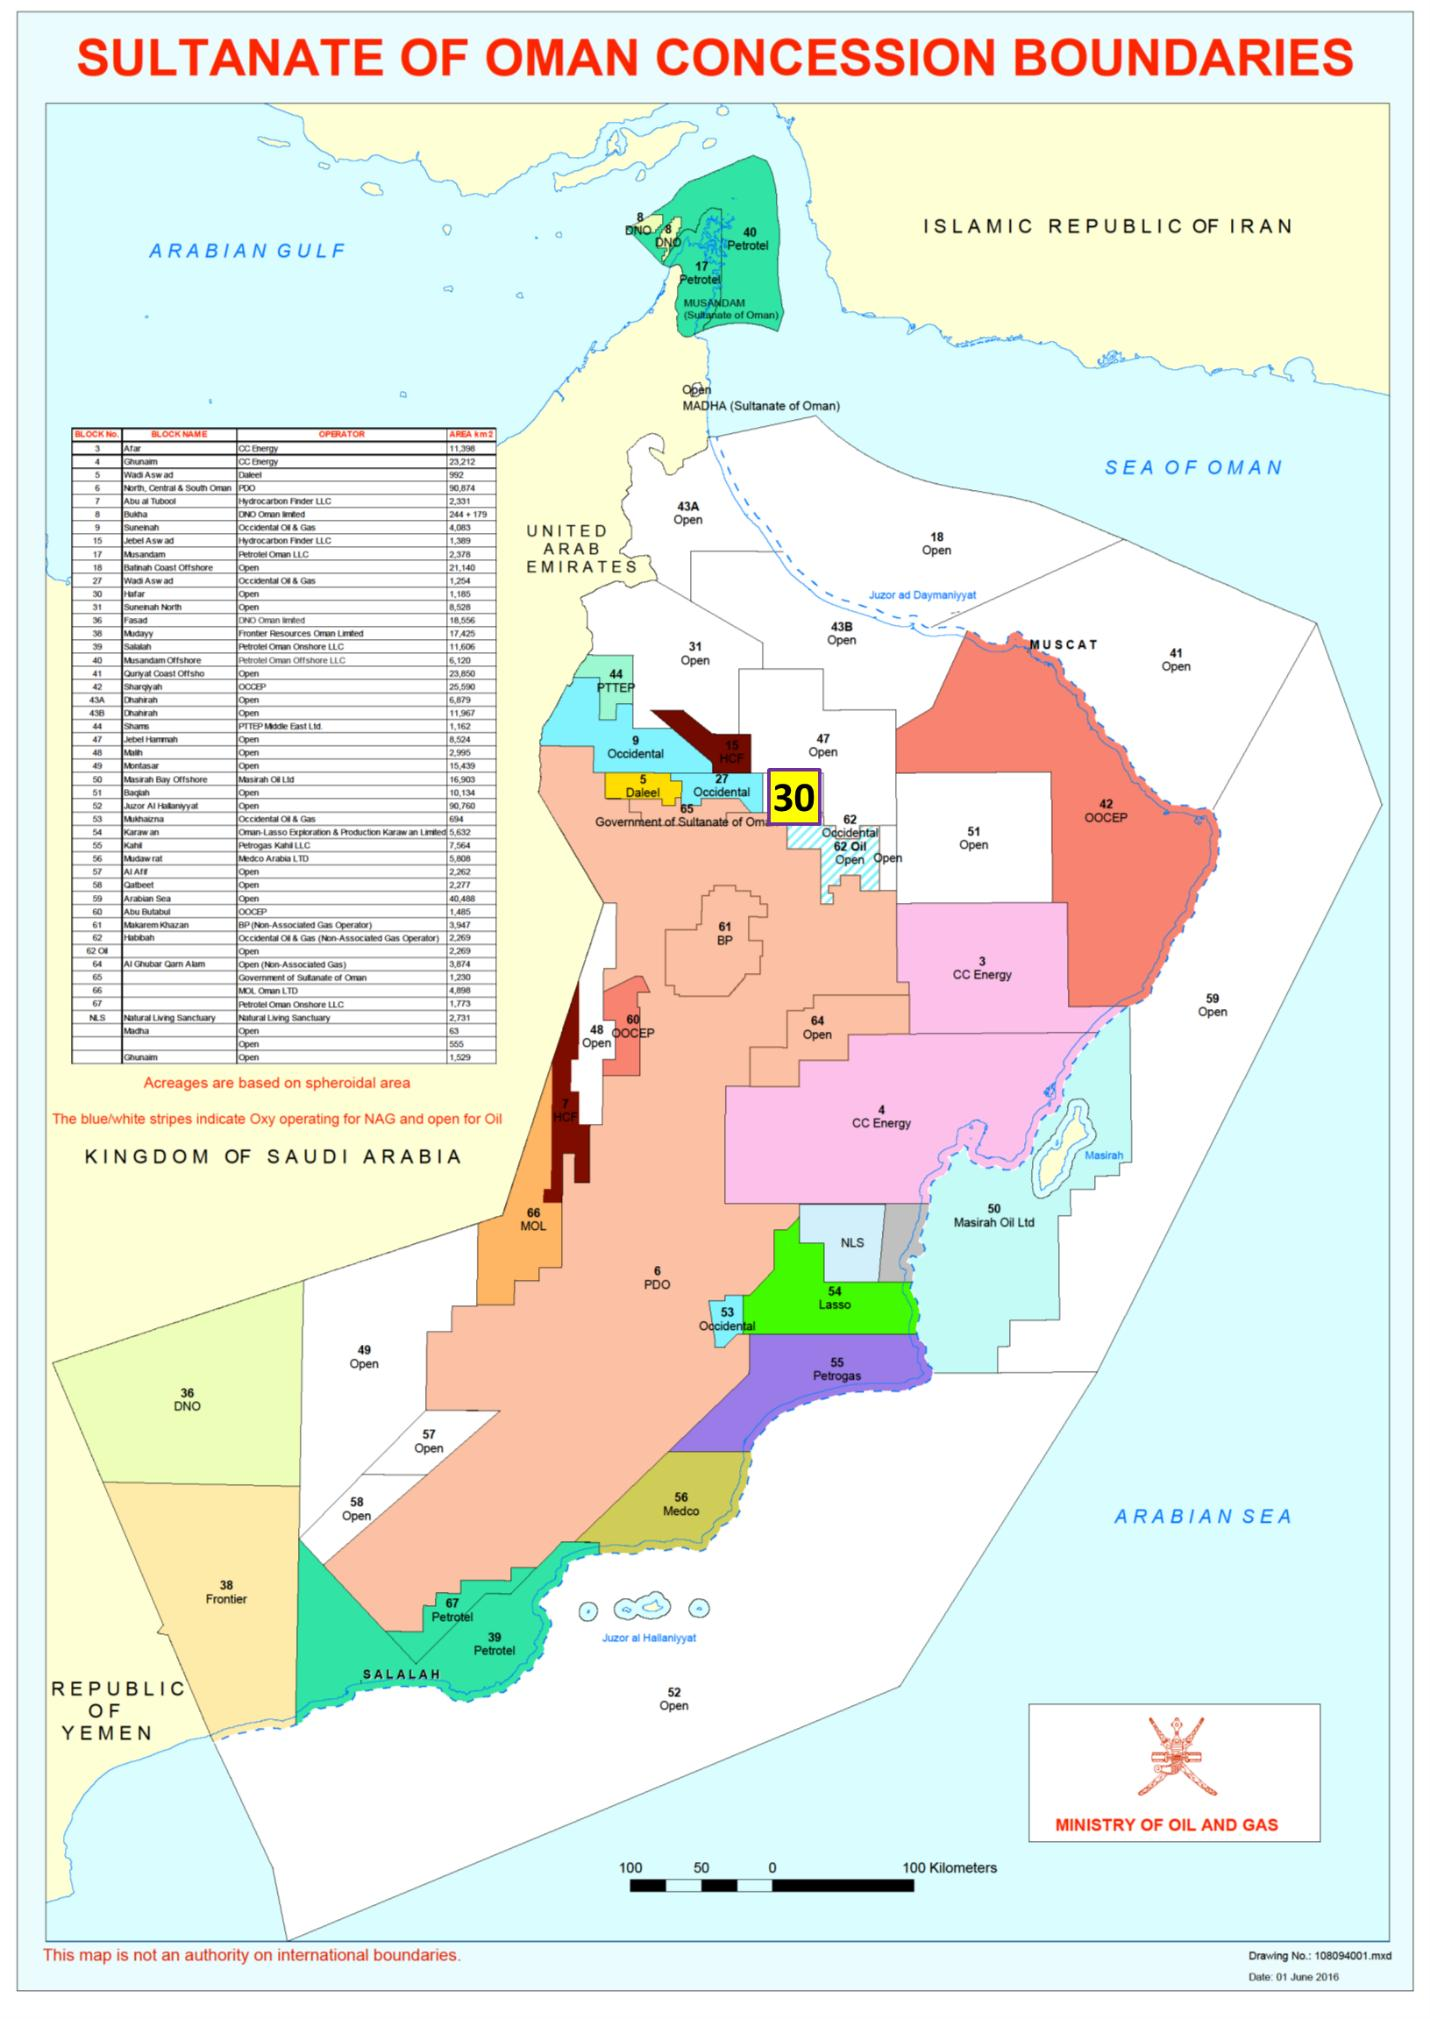 oman karta Lekhwair Oman karta   Karta över lekhwair Oman (Västra Asien   Asien) oman karta